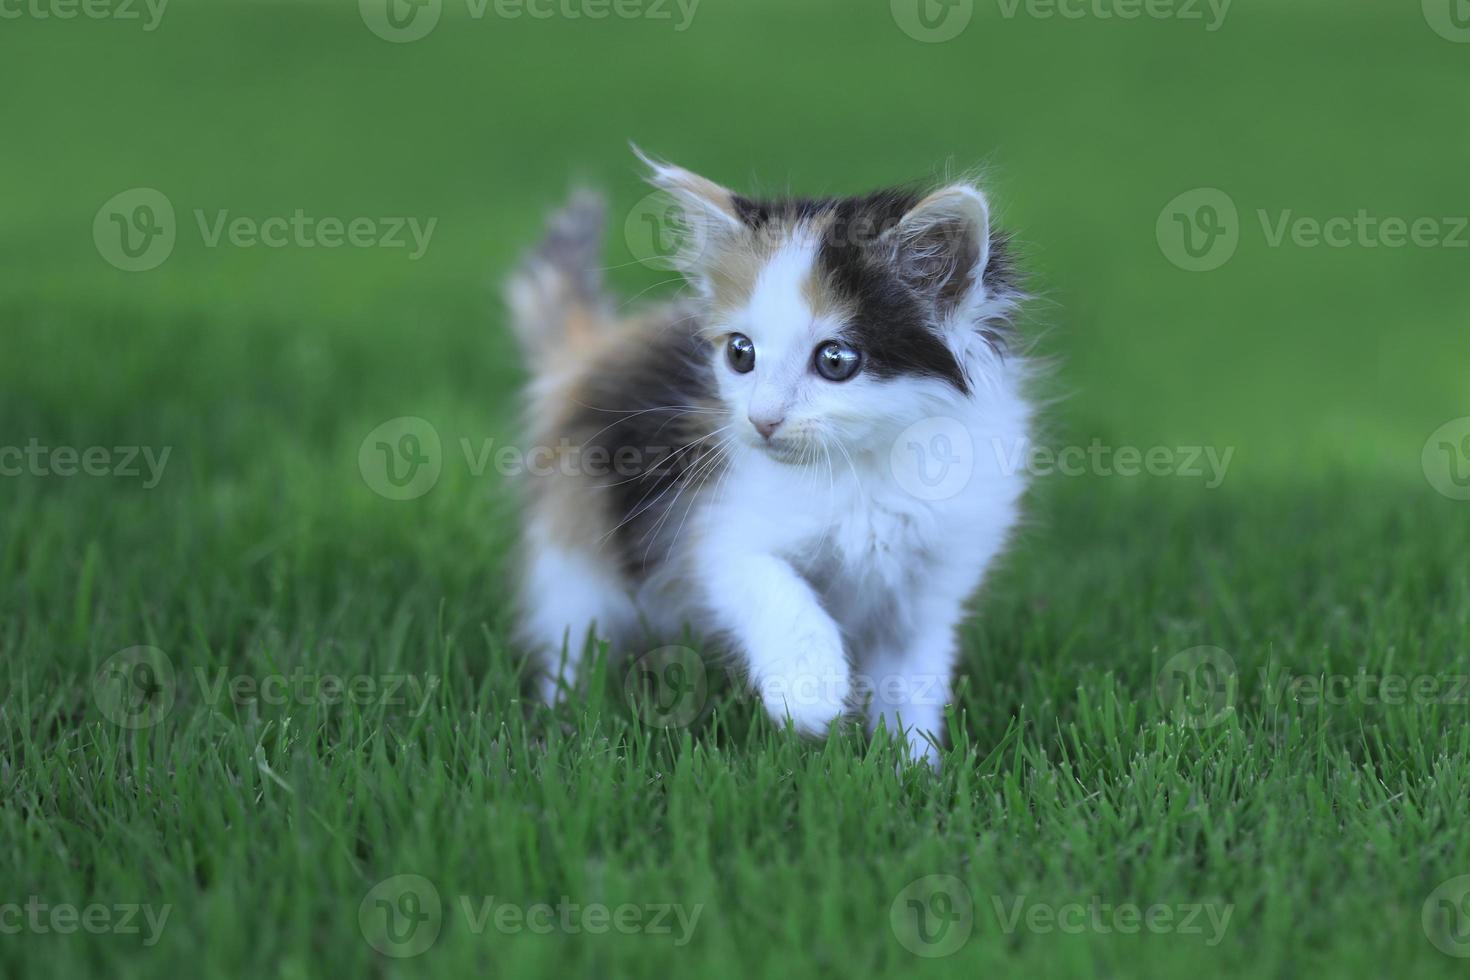 calico kattunge utomhus i det gröna gräset foto